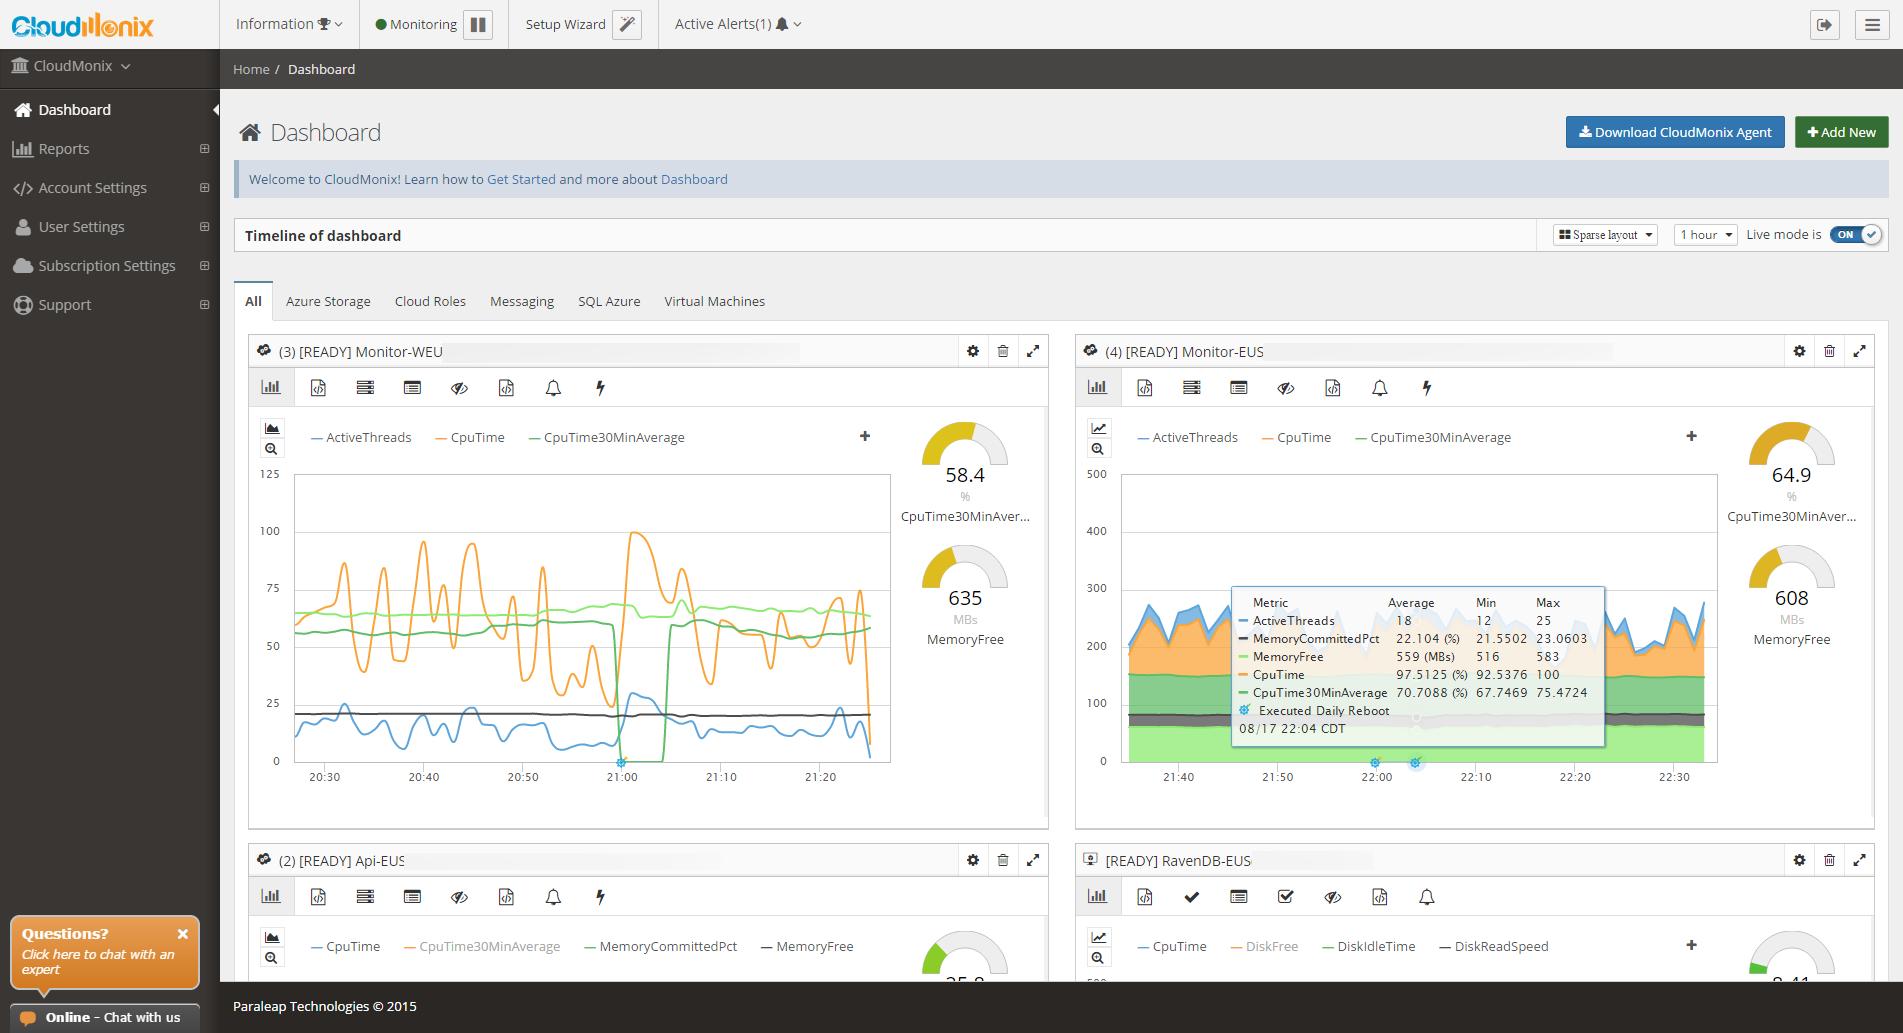 CloudMonix Demo - Dashboard view